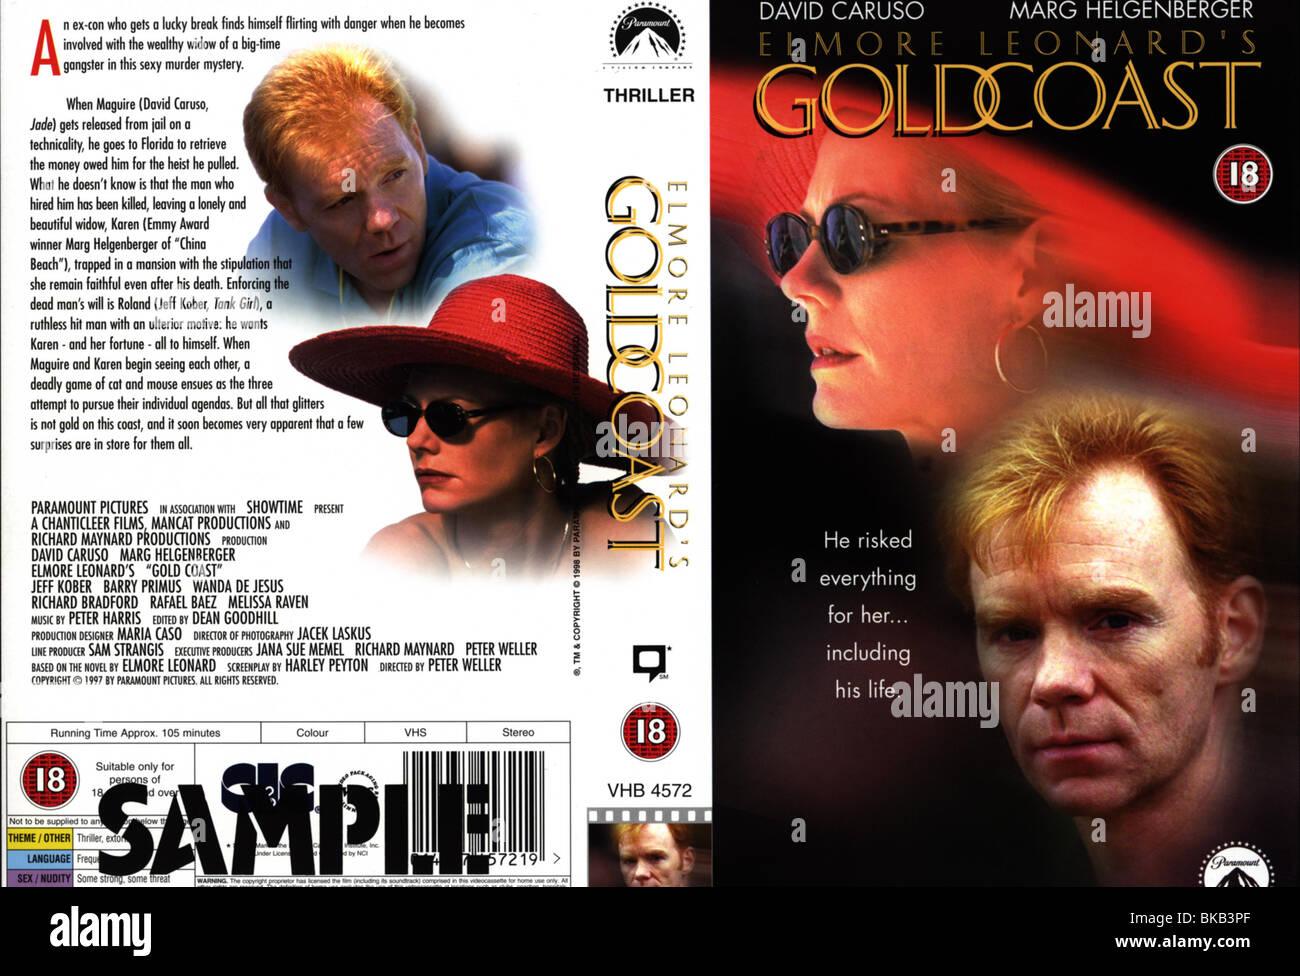 GOLDCOAST (1997) MARG HELGENBERGER, David Caruso GOST 001VS Immagini Stock